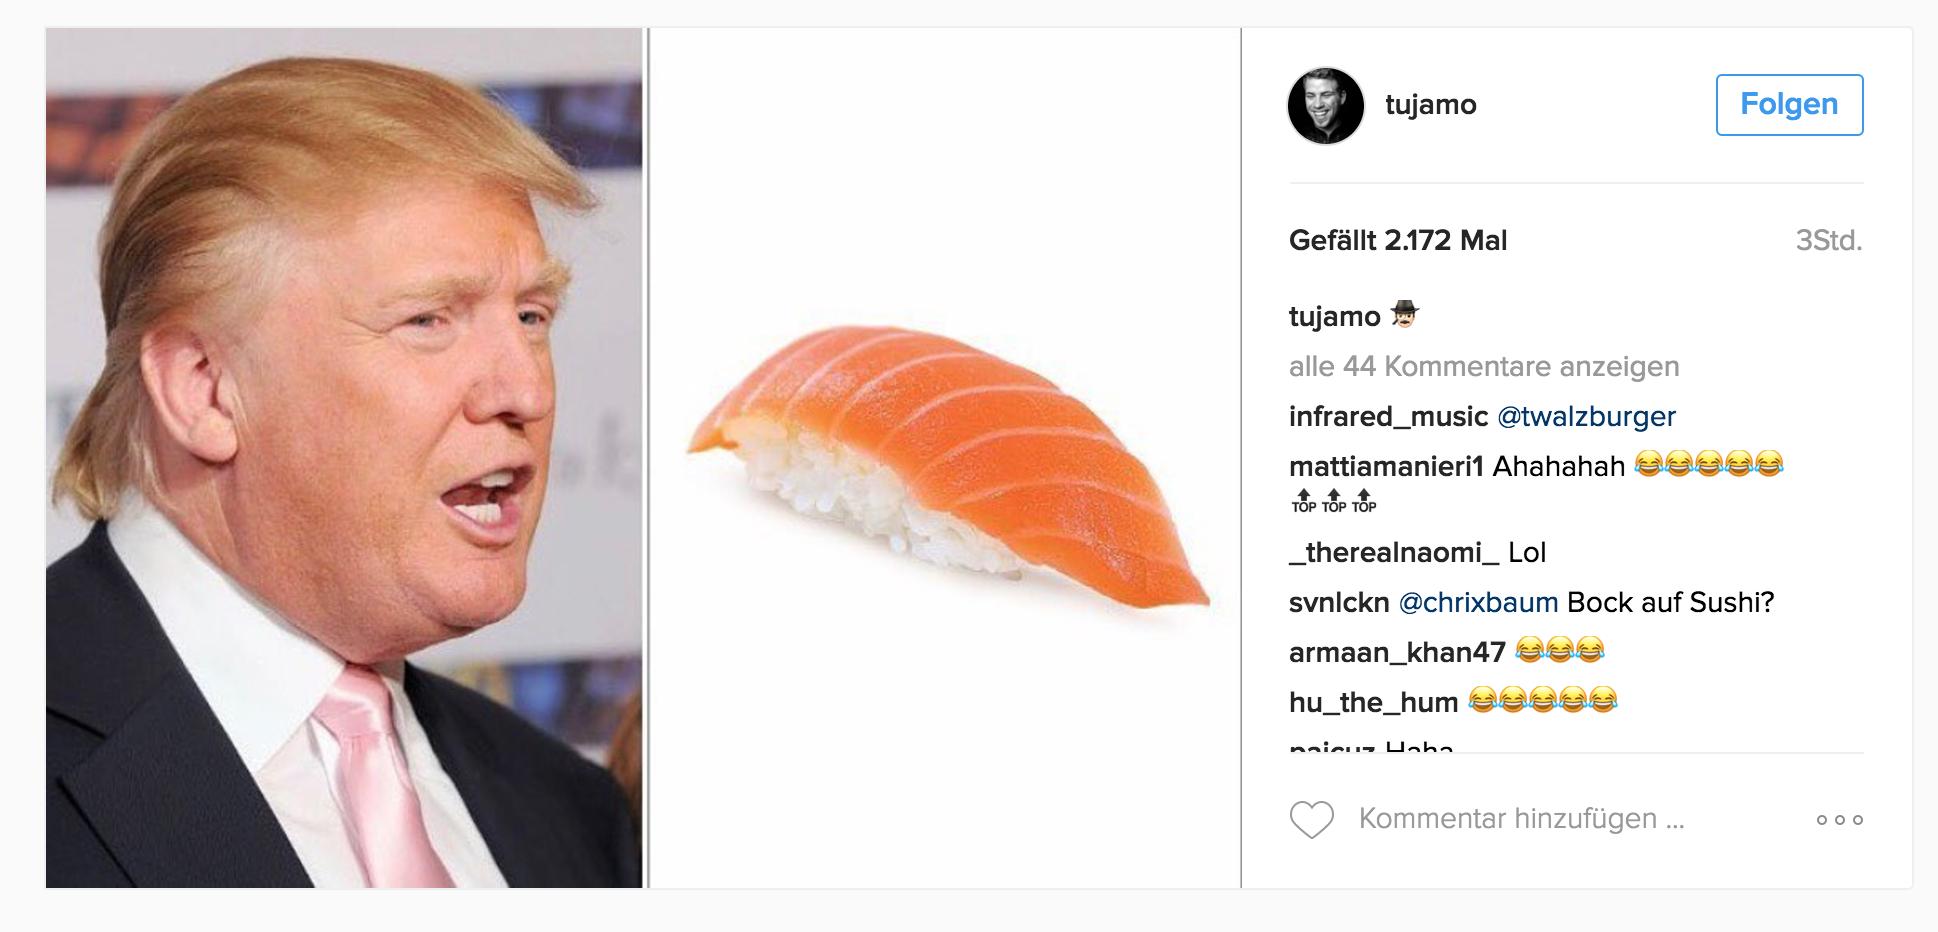 Tujamo Trump electrion 2016